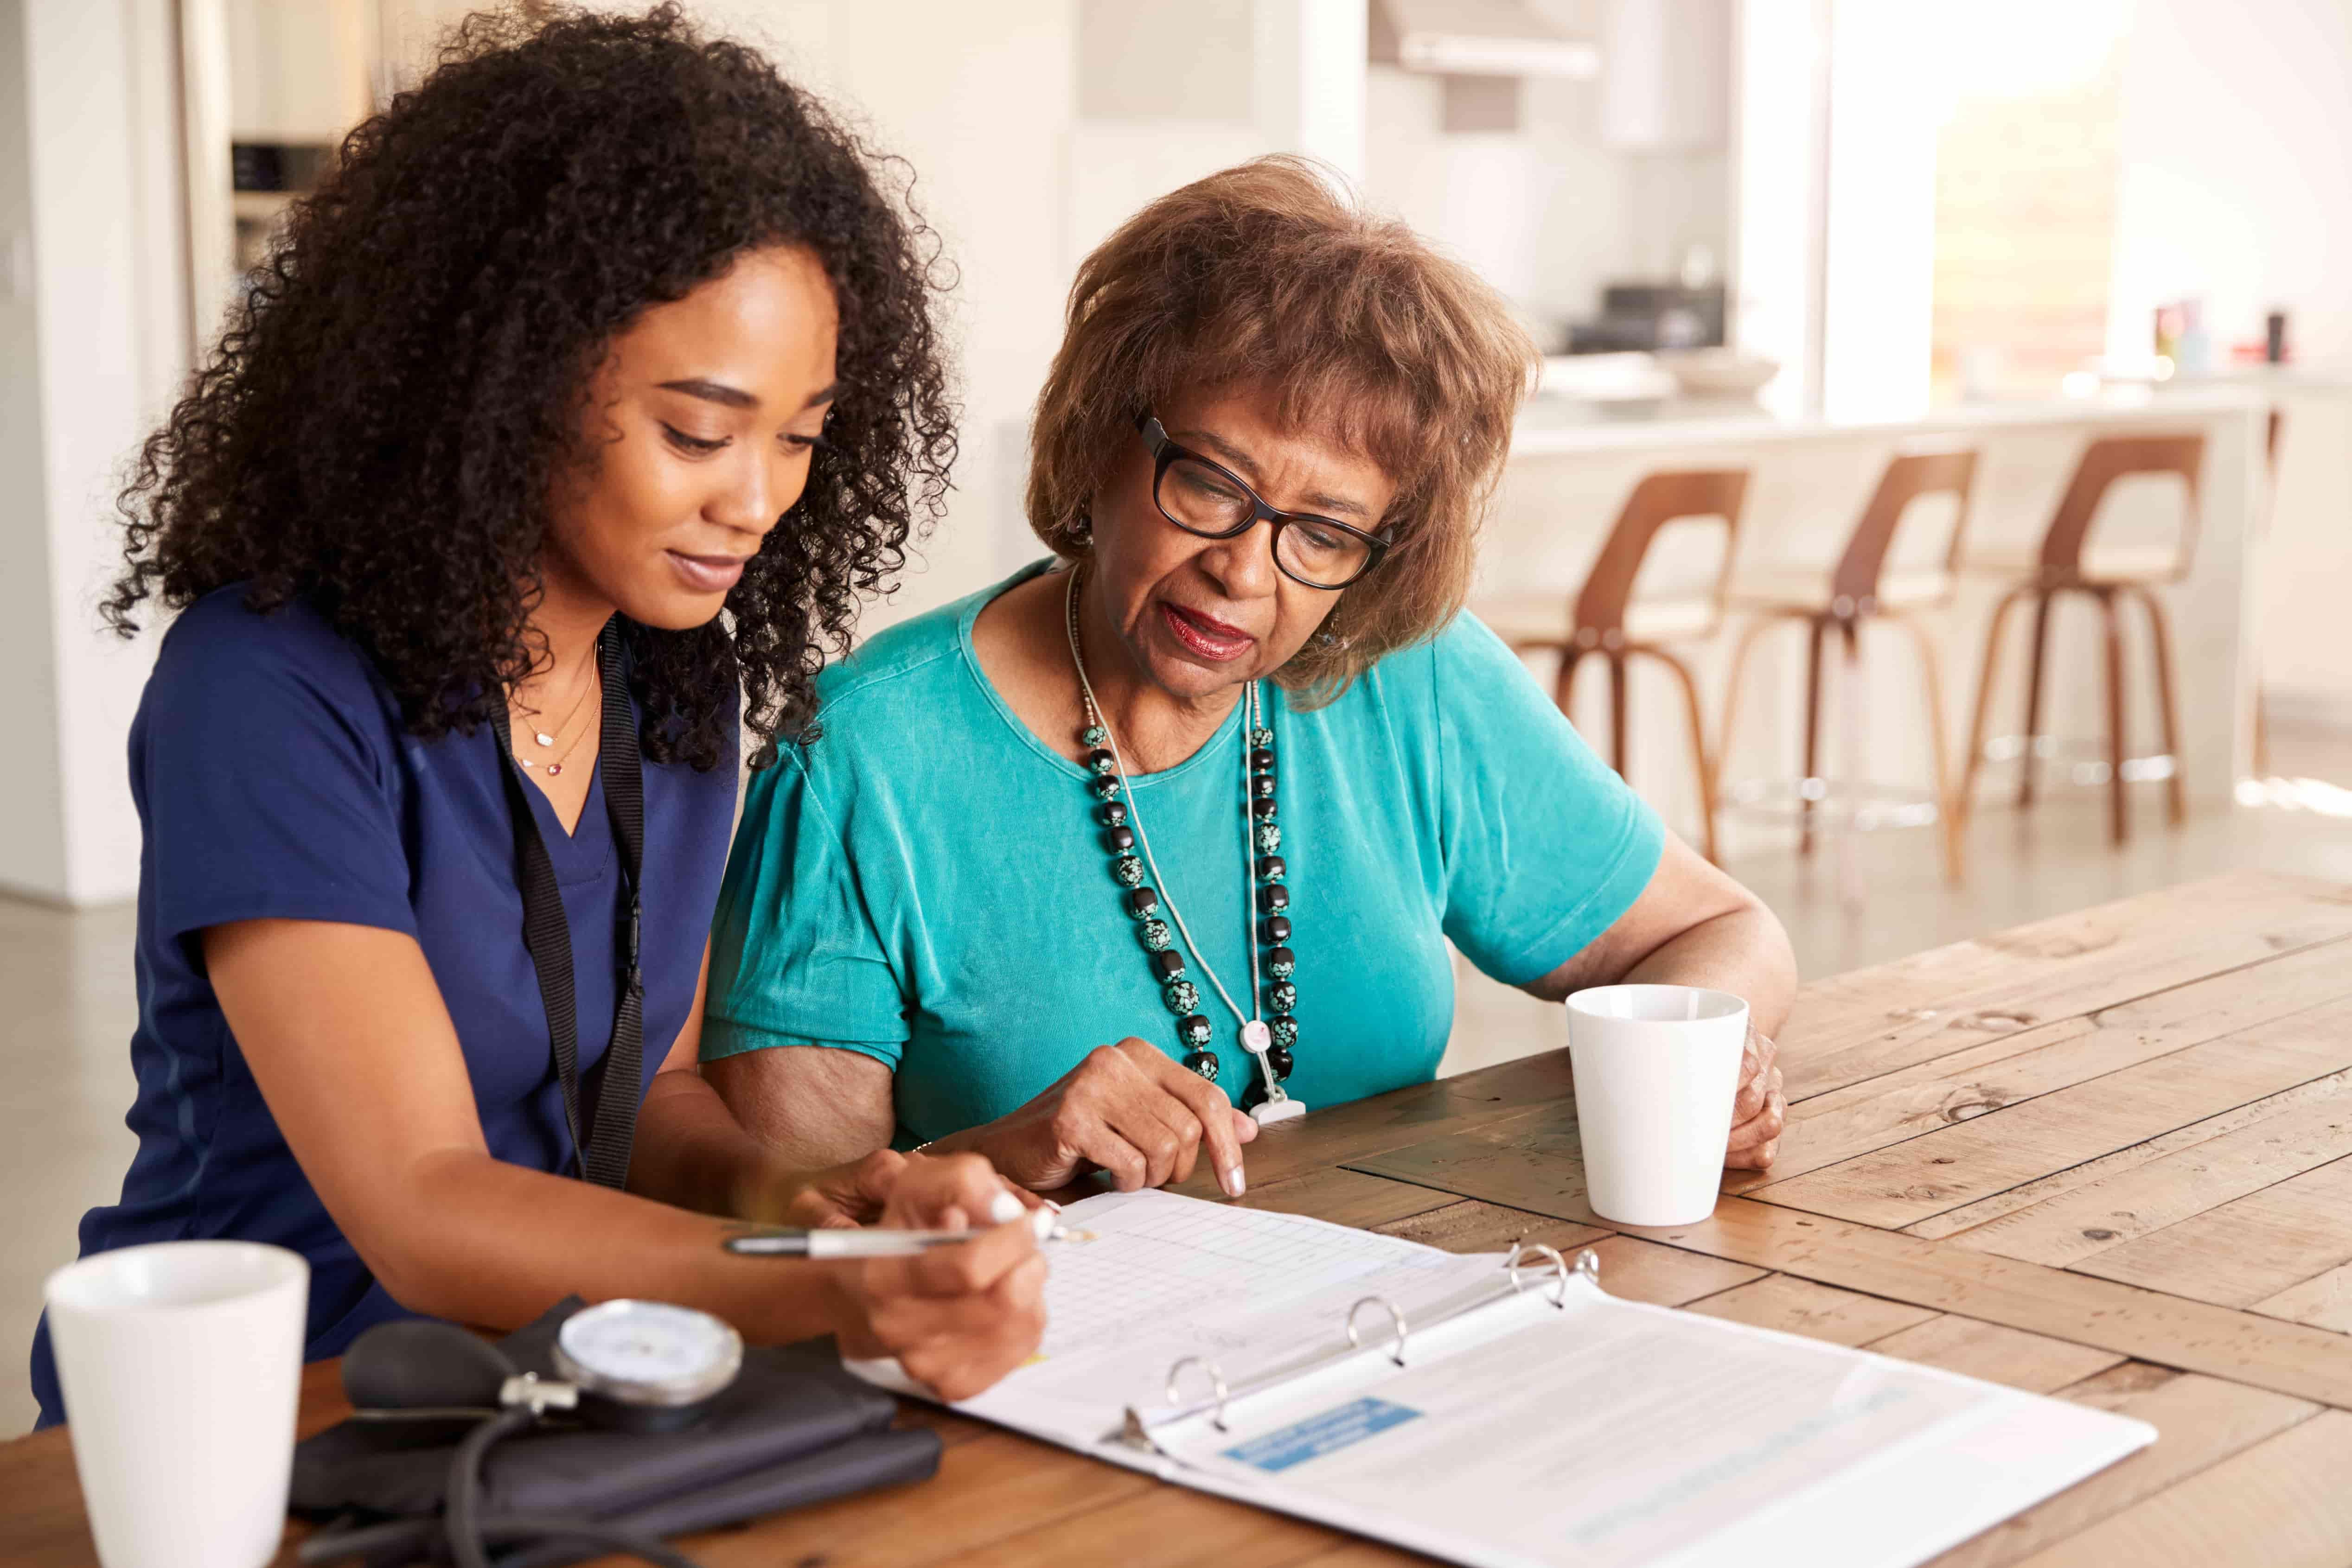 4 Strategies to Pass the NCLEX Registered Nurse Exam